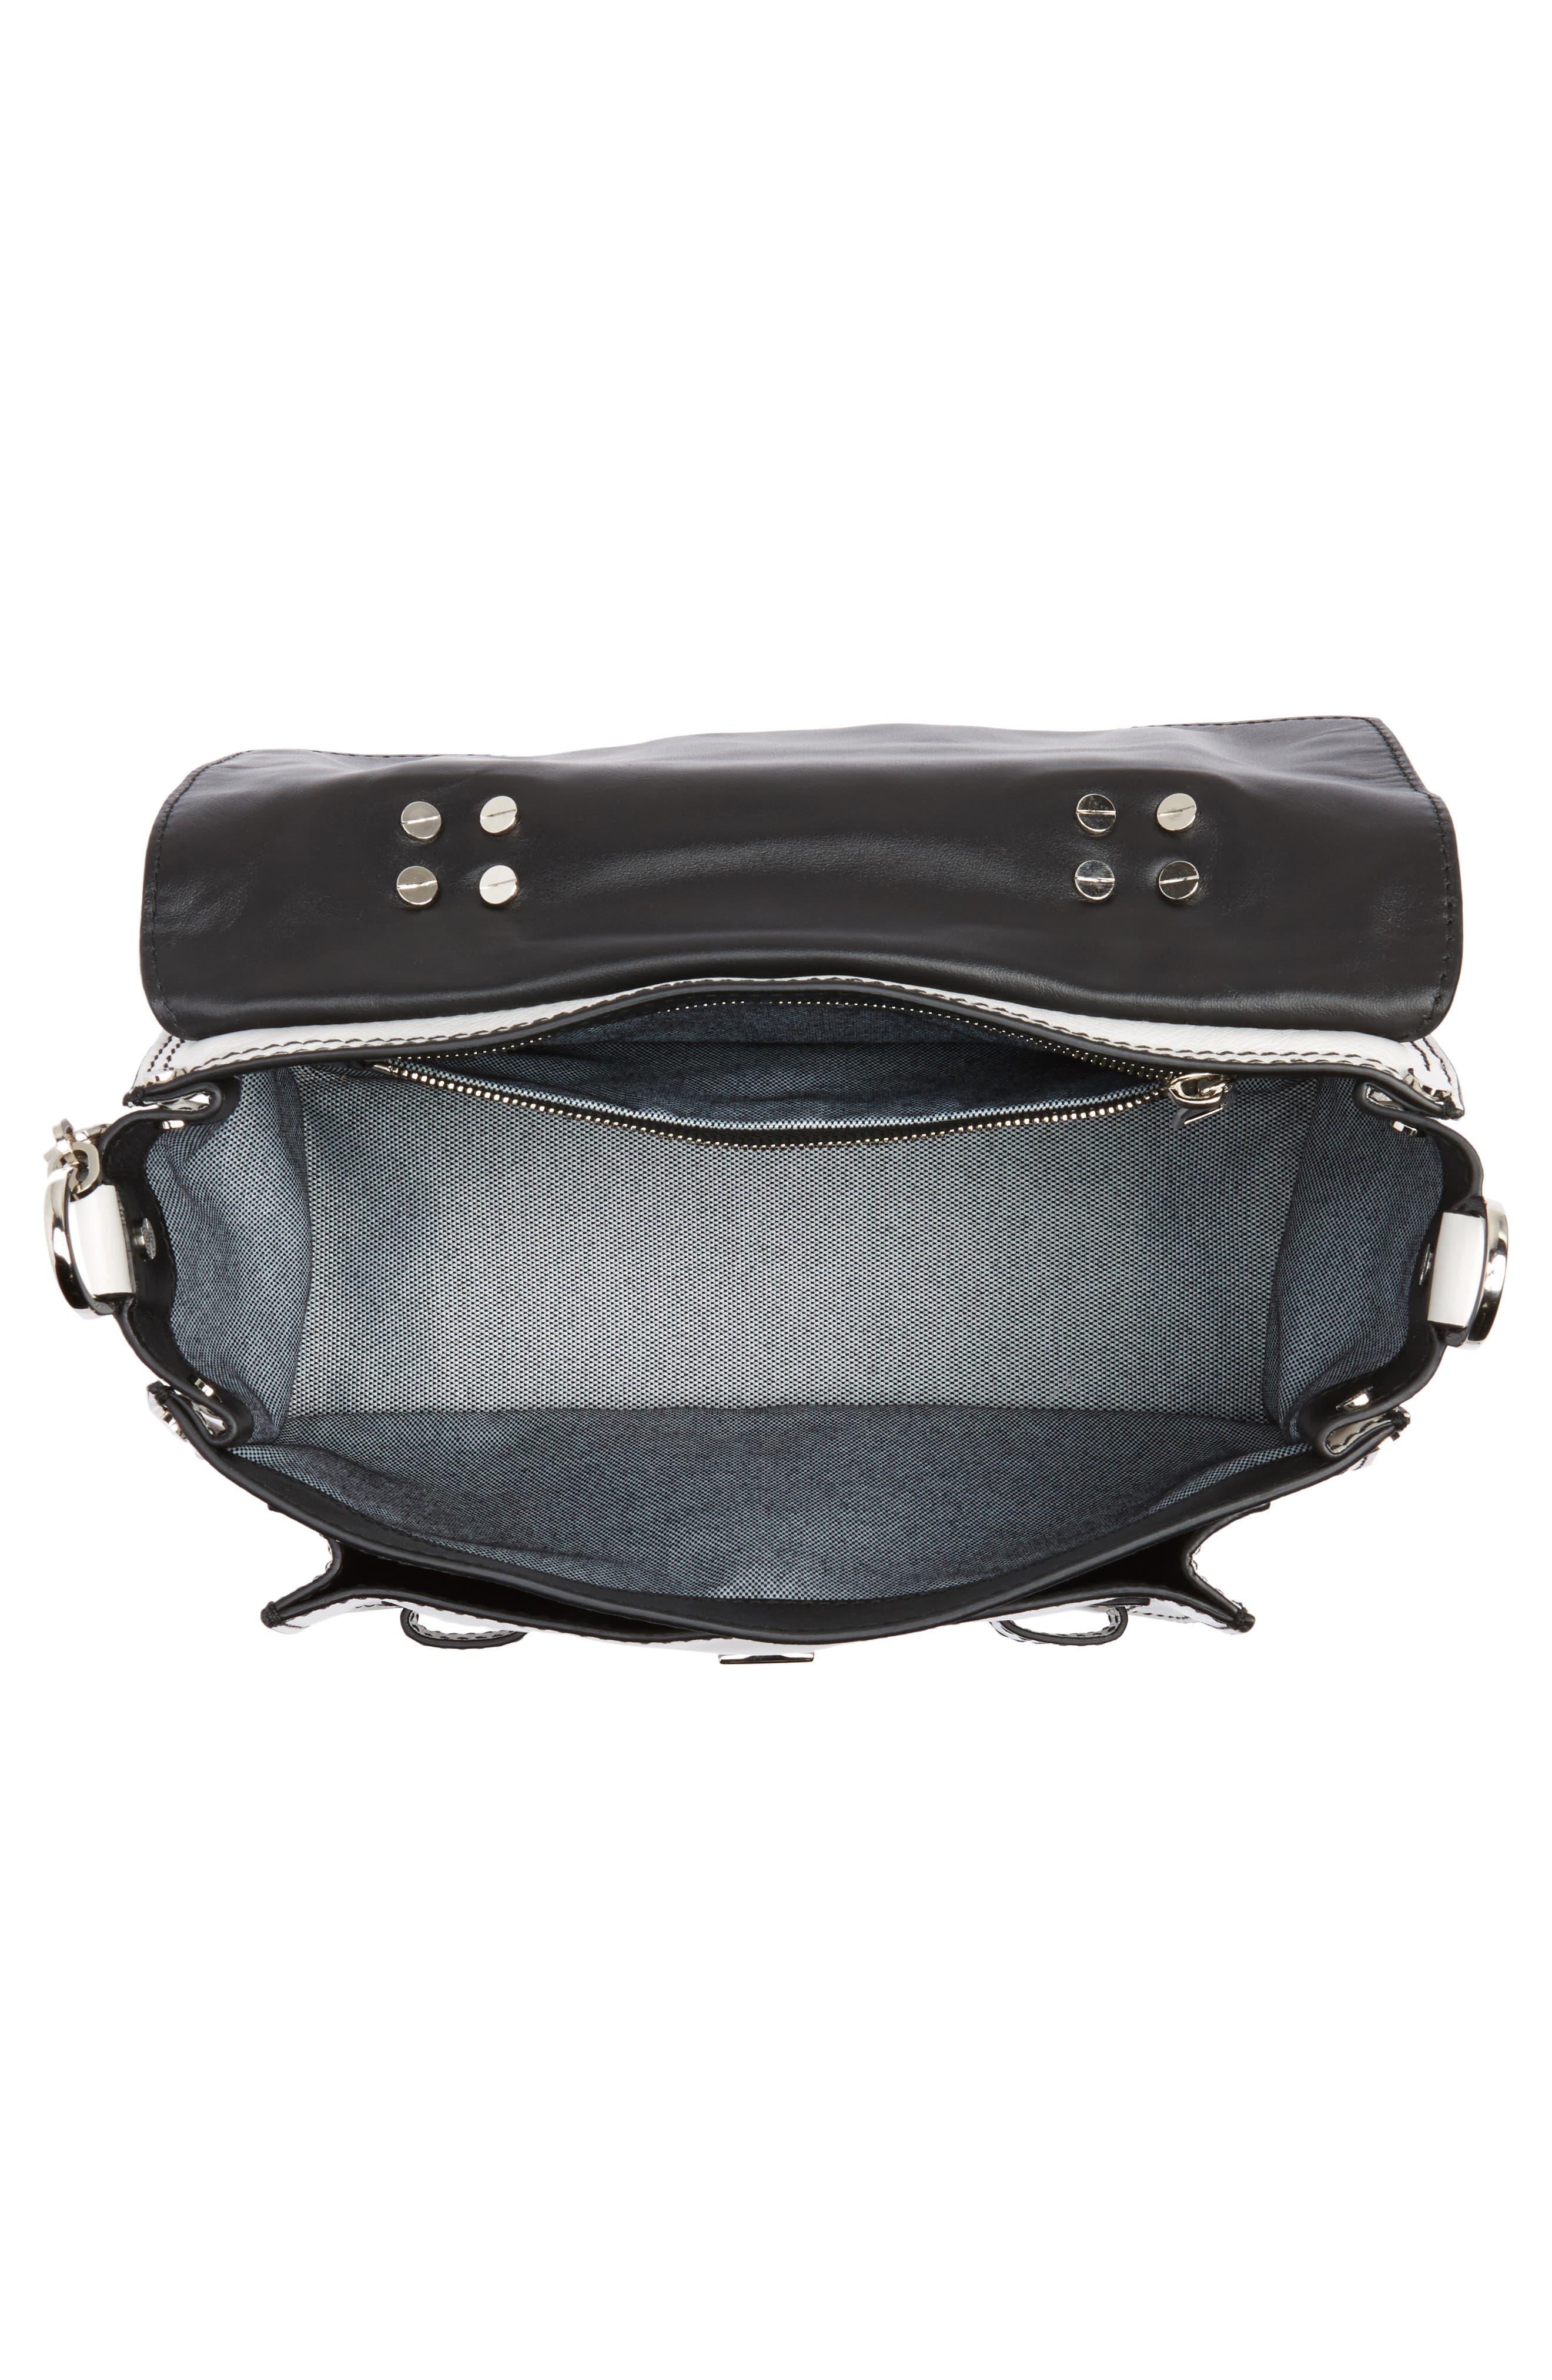 Tiny PS1 Calfskin Leather Satchel with Novelty Shoulder/Crossbody Strap,                             Alternate thumbnail 4, color,                             102